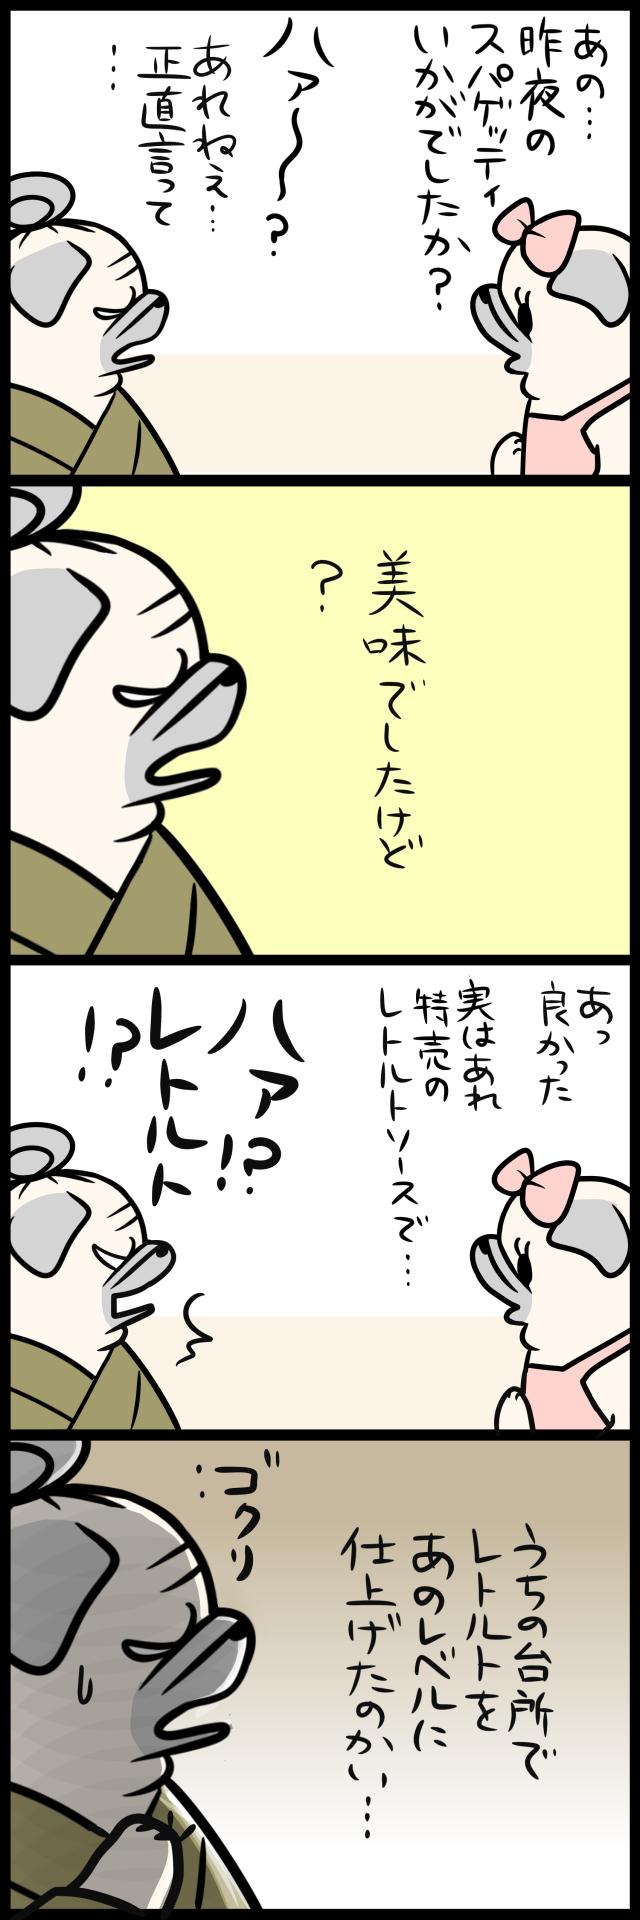 569c2a6f